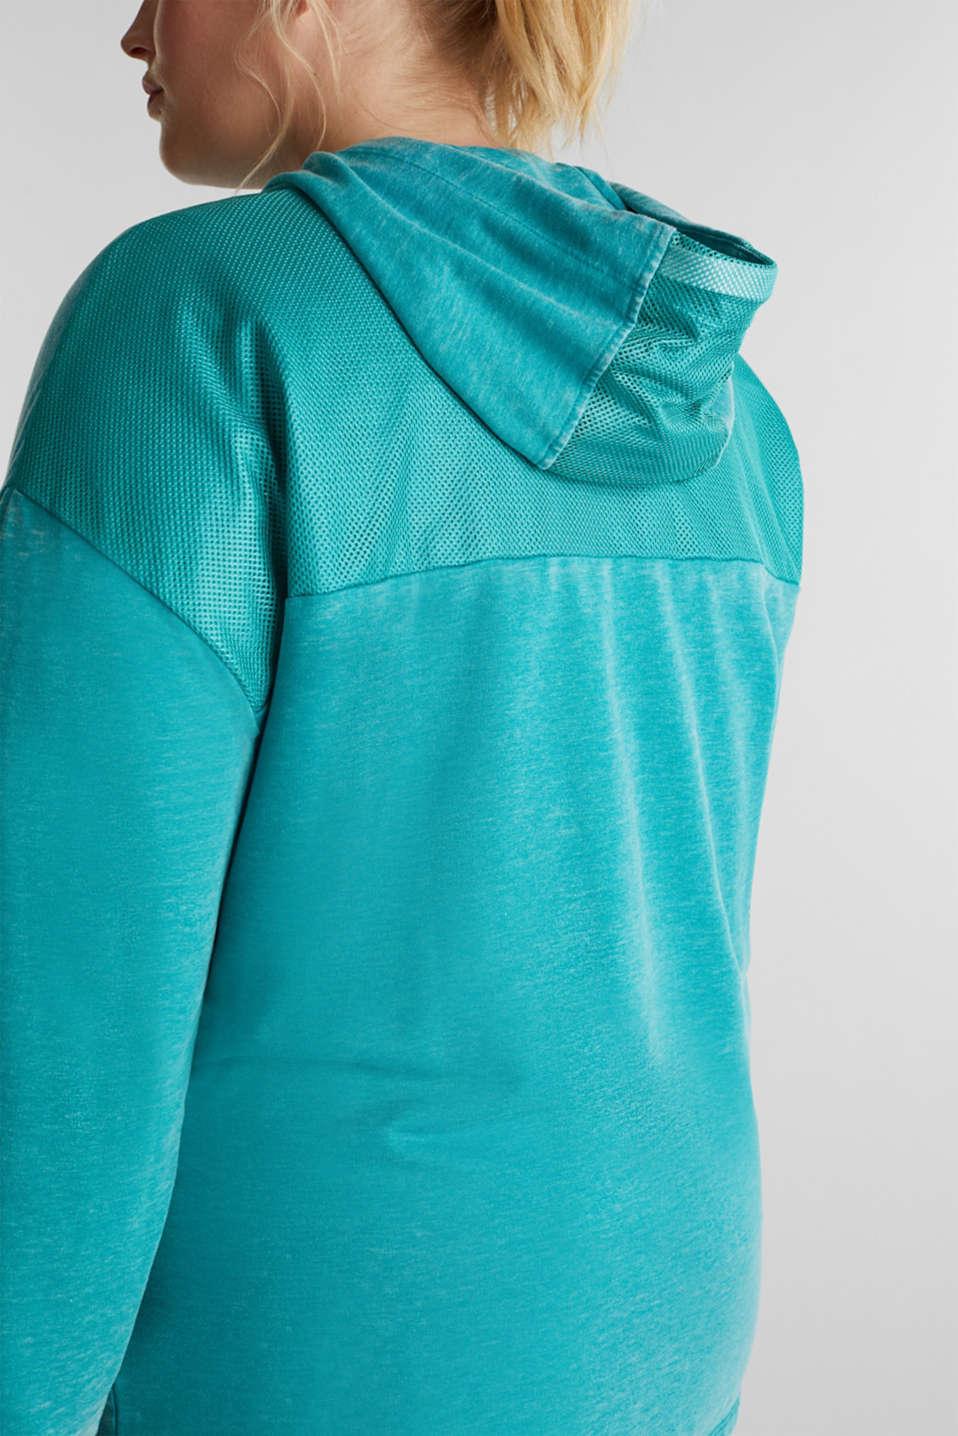 Curvy sweatshirt cardigan with a hood, TEAL GREEN, detail image number 2